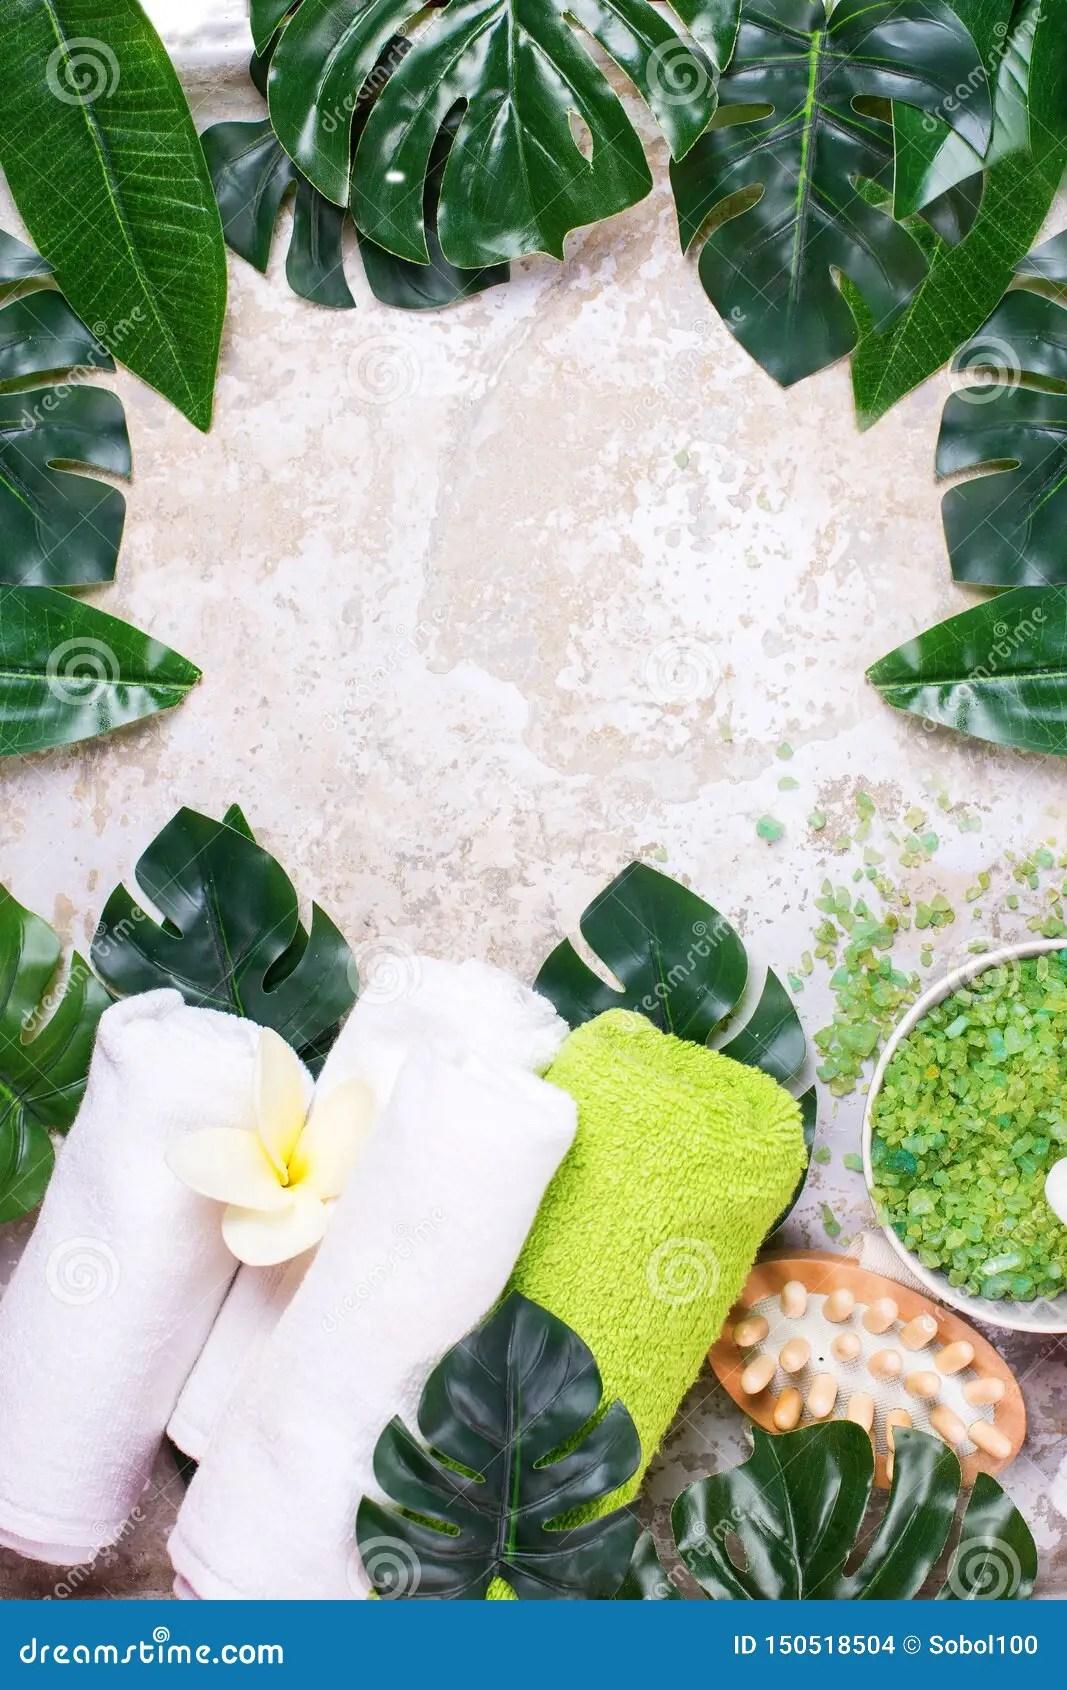 Tropical Spa Setting Layout Stock Photo - Image of alternative. evergreen: 150518504